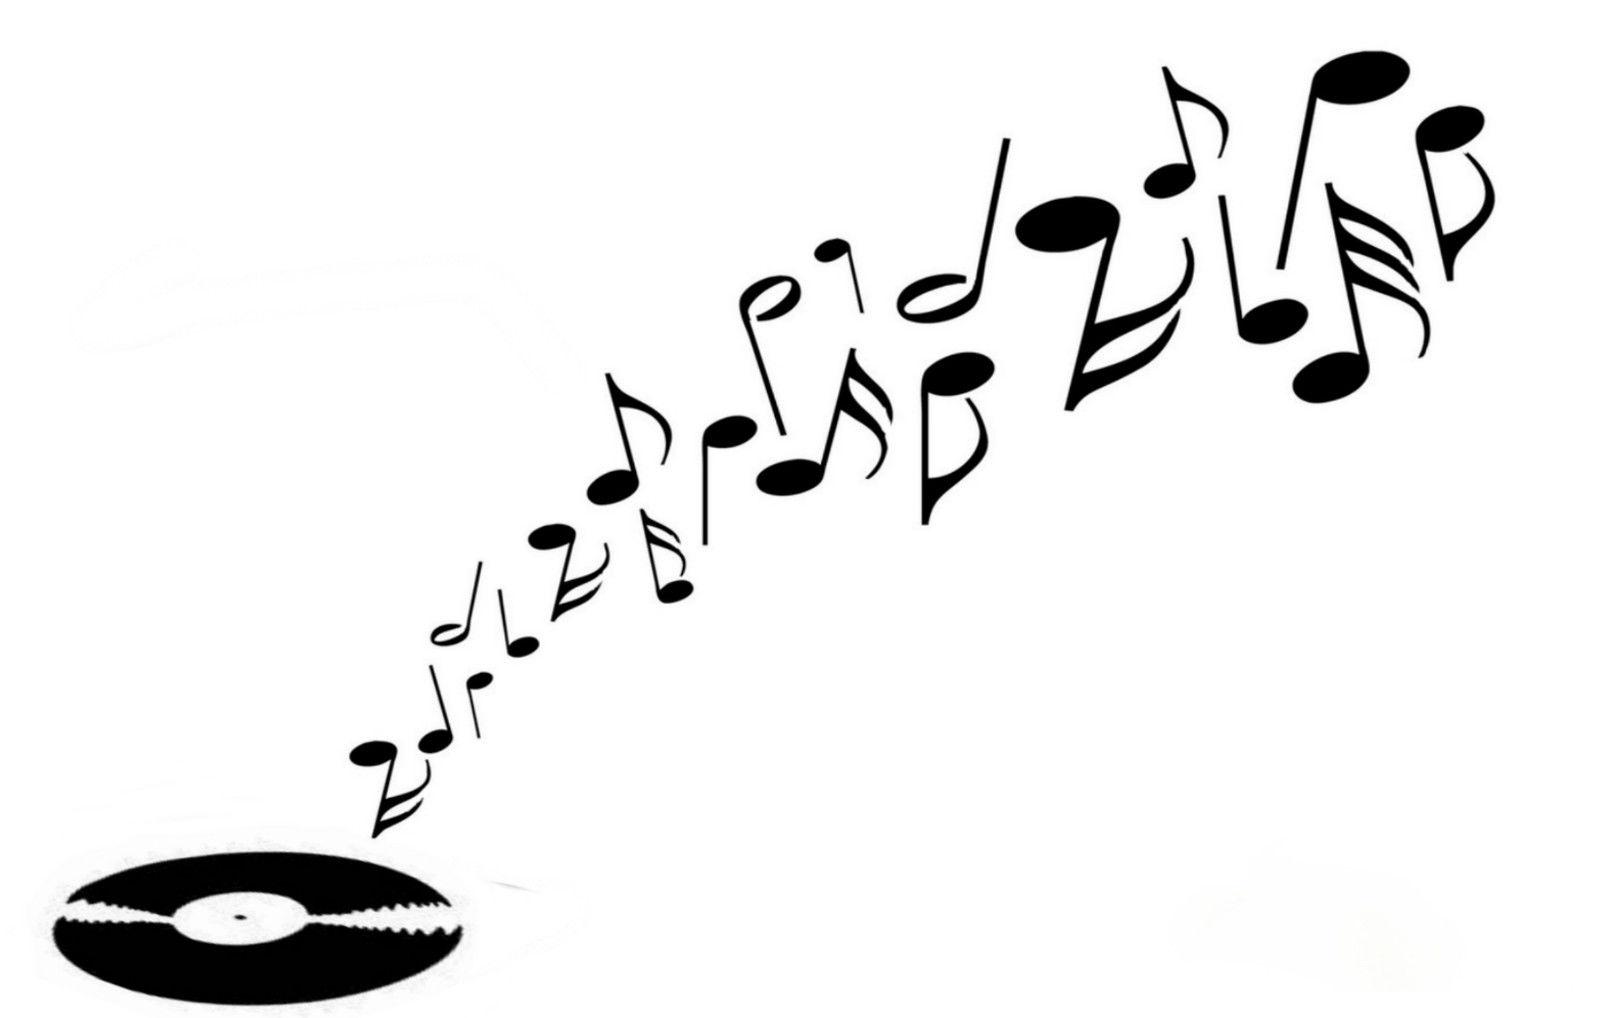 Music Record stencil cake decorating